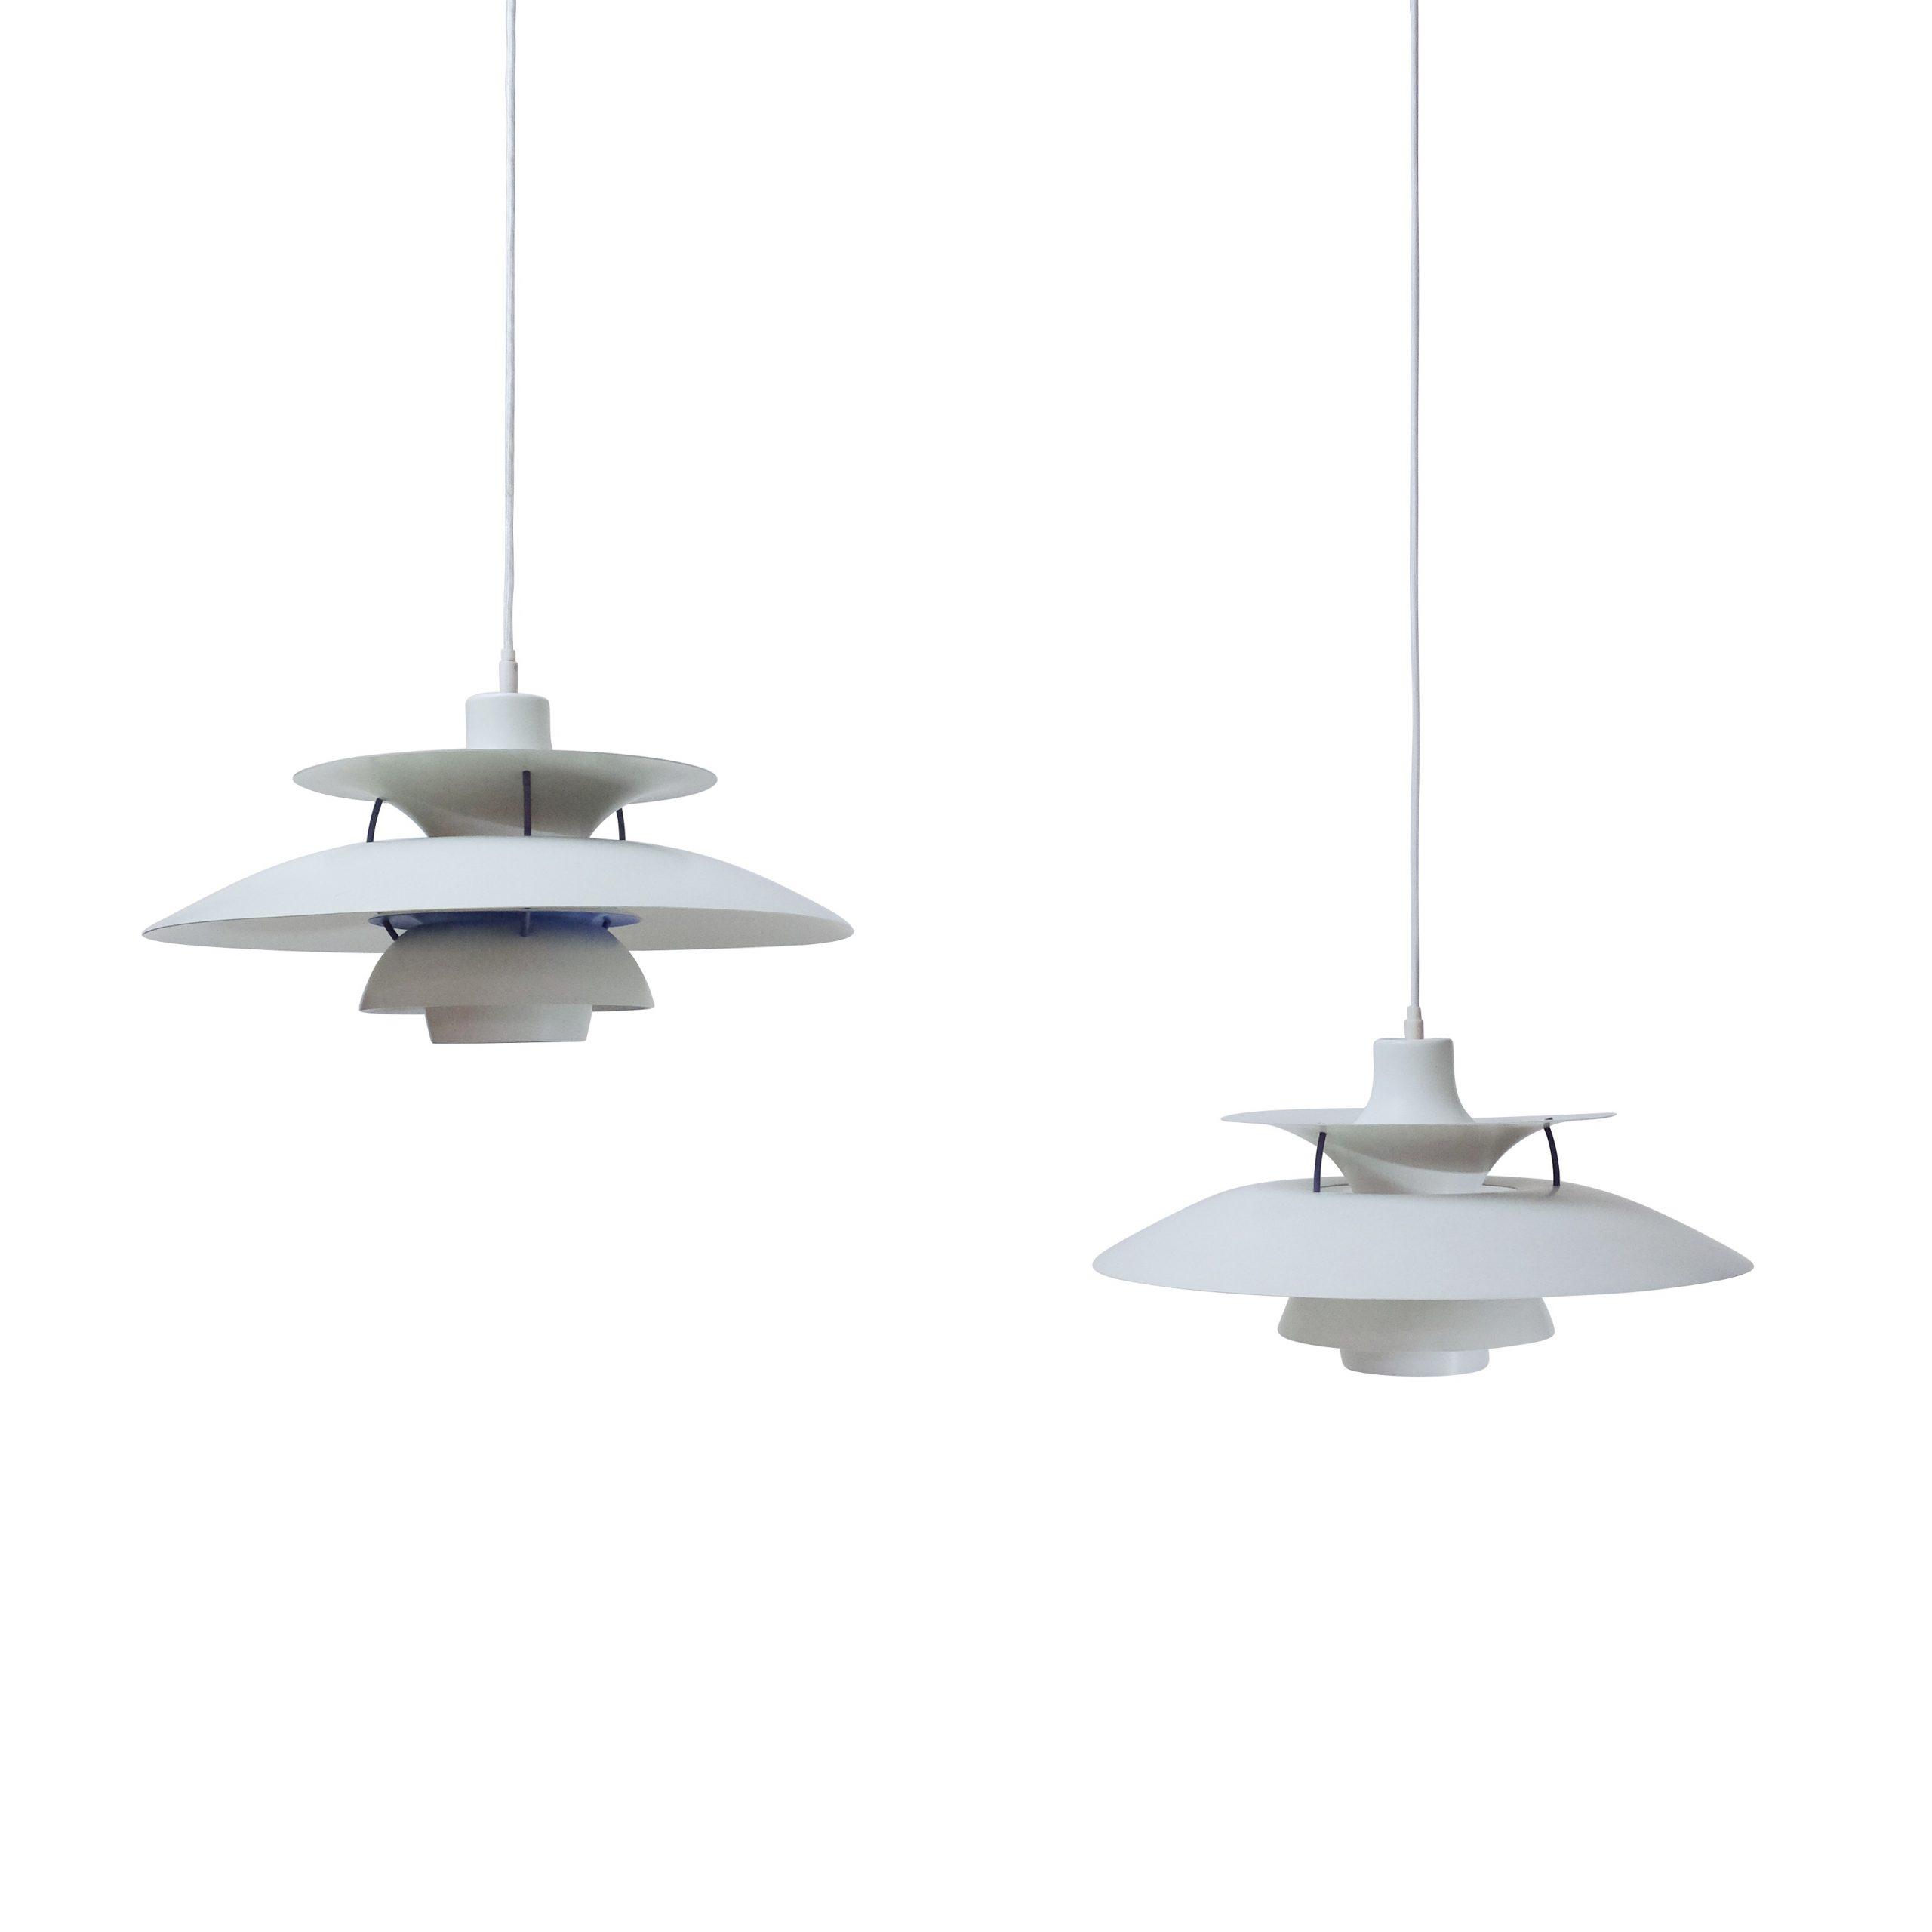 Vintage White Poul Henningsen PH5 Lamp Metal 1960s Symple Design